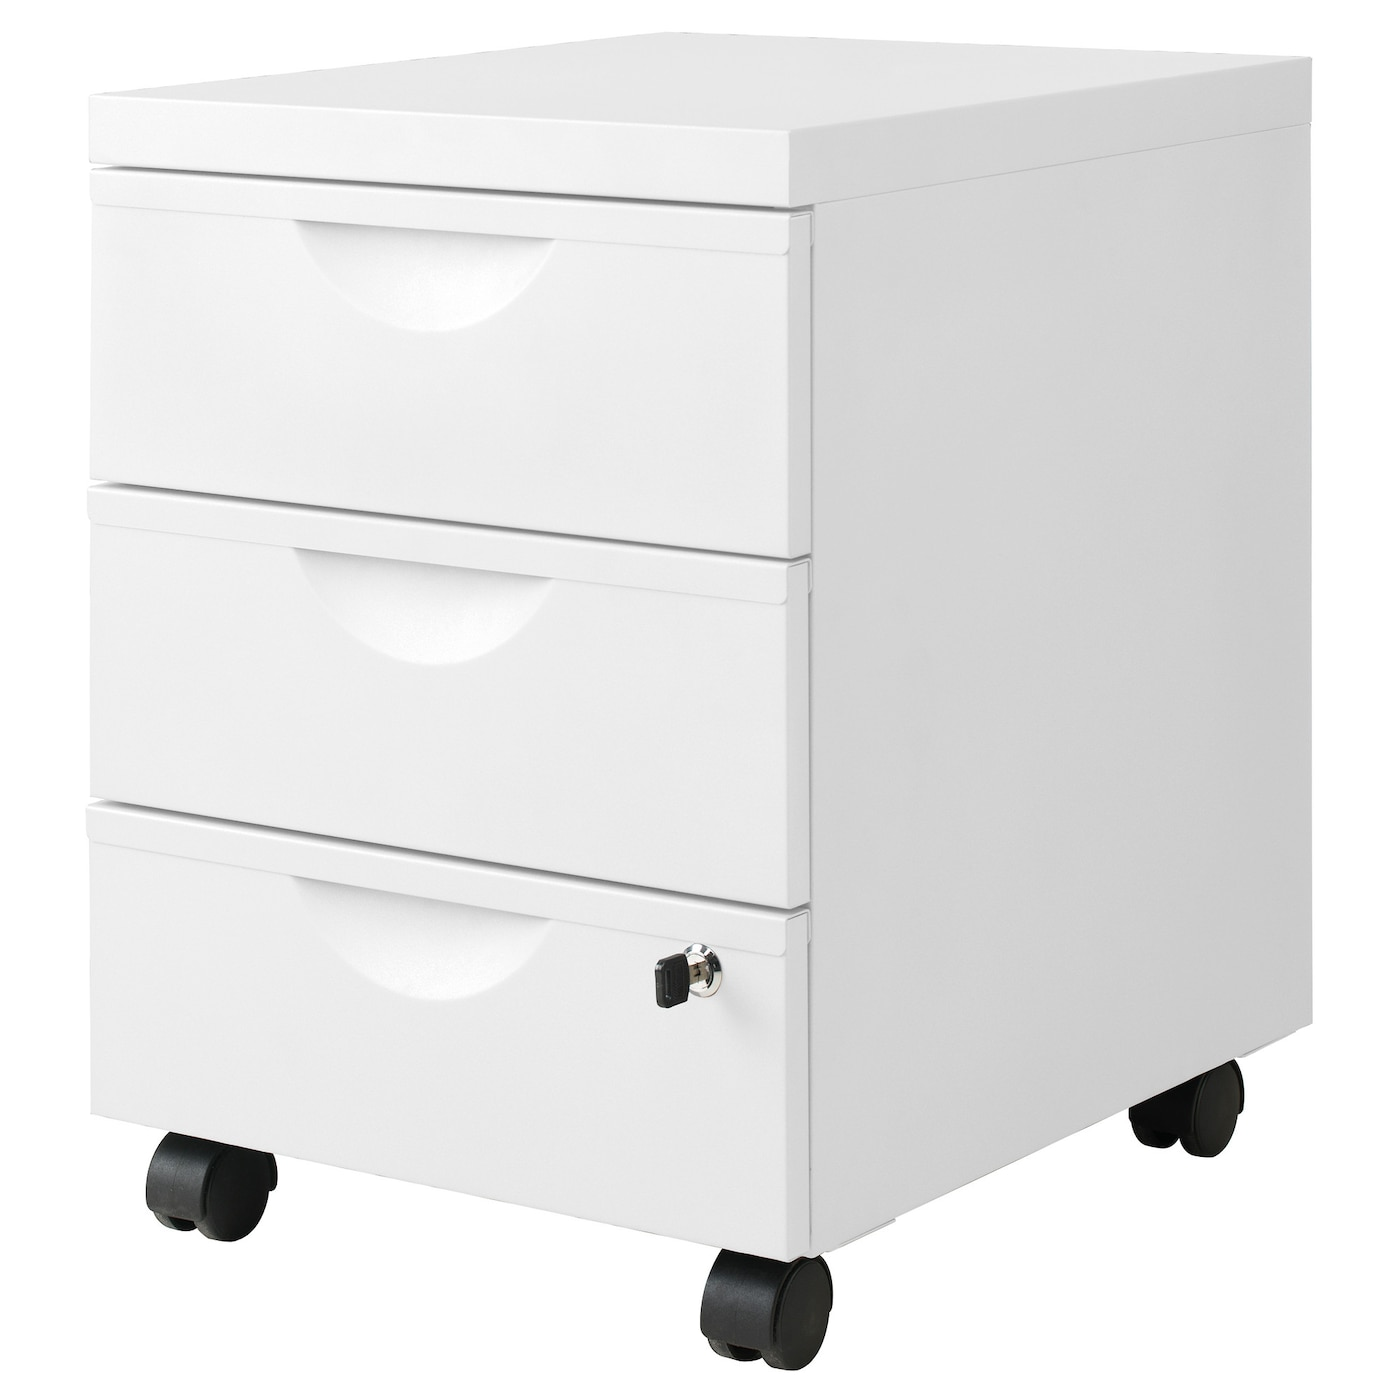 Ikea Rollcontainer Online Kaufen Mobel Suchmaschine Ladendirekt De